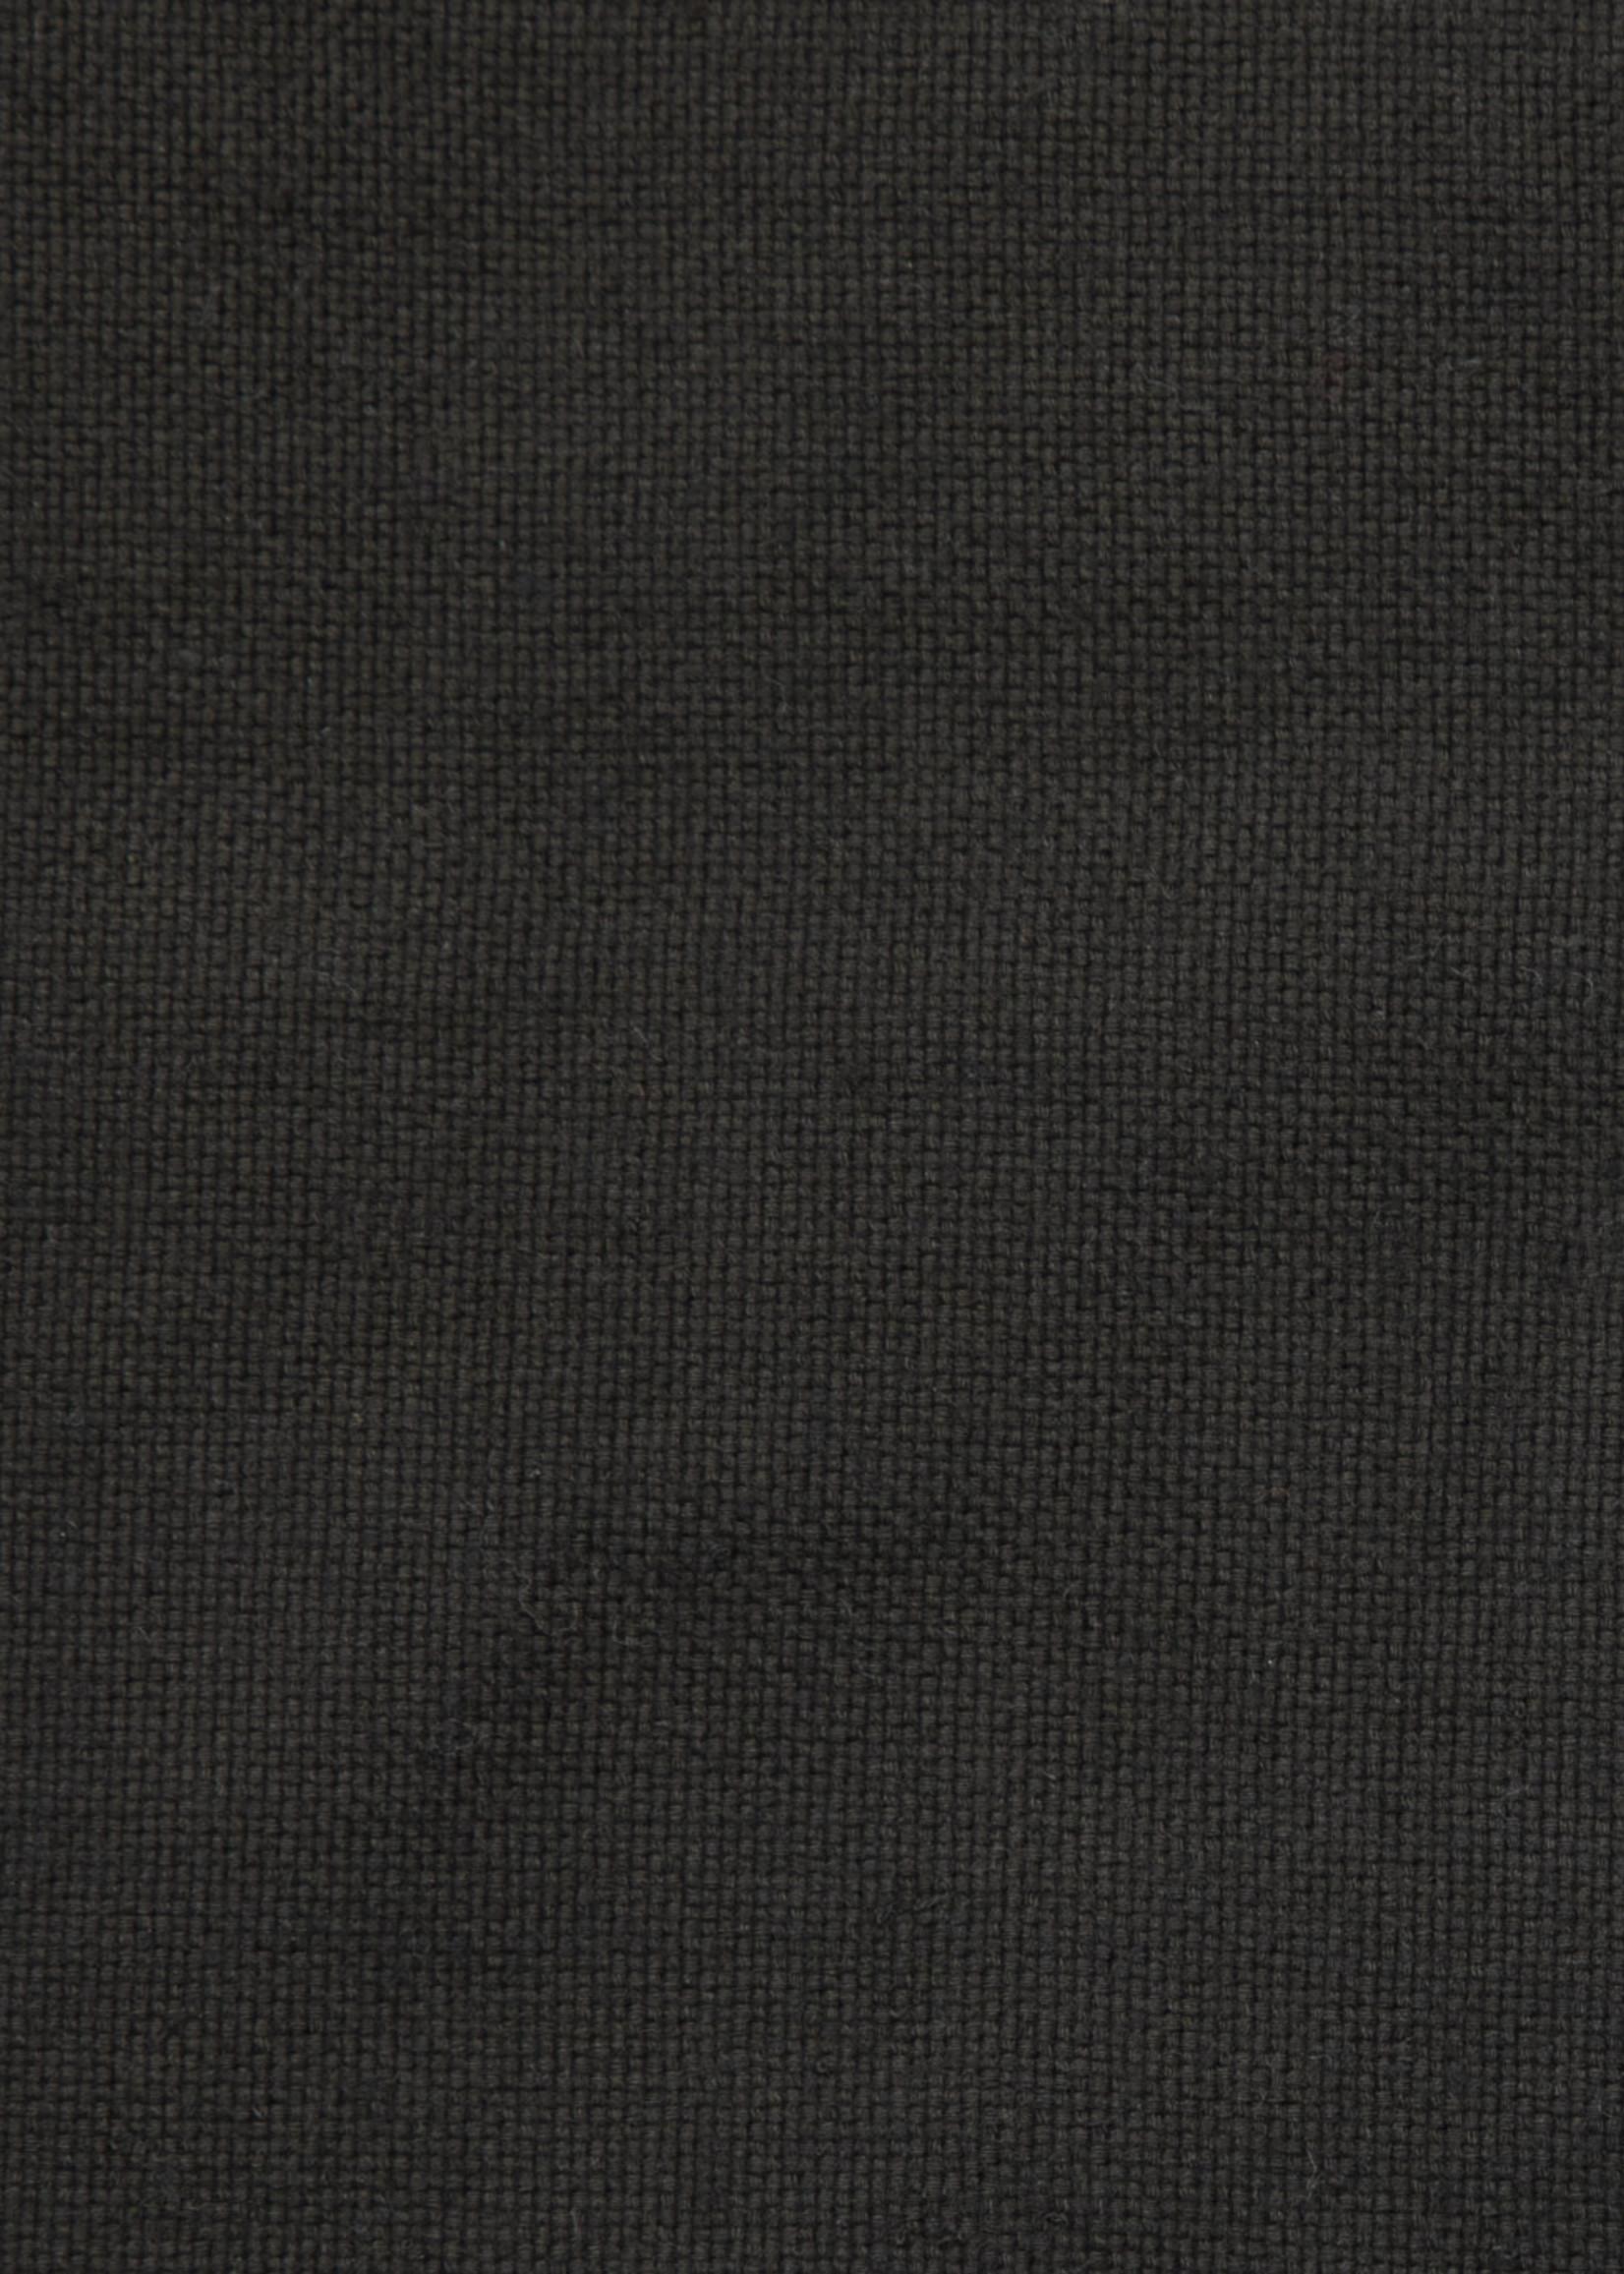 Kardo Leo Dark Green Vest by Kardo